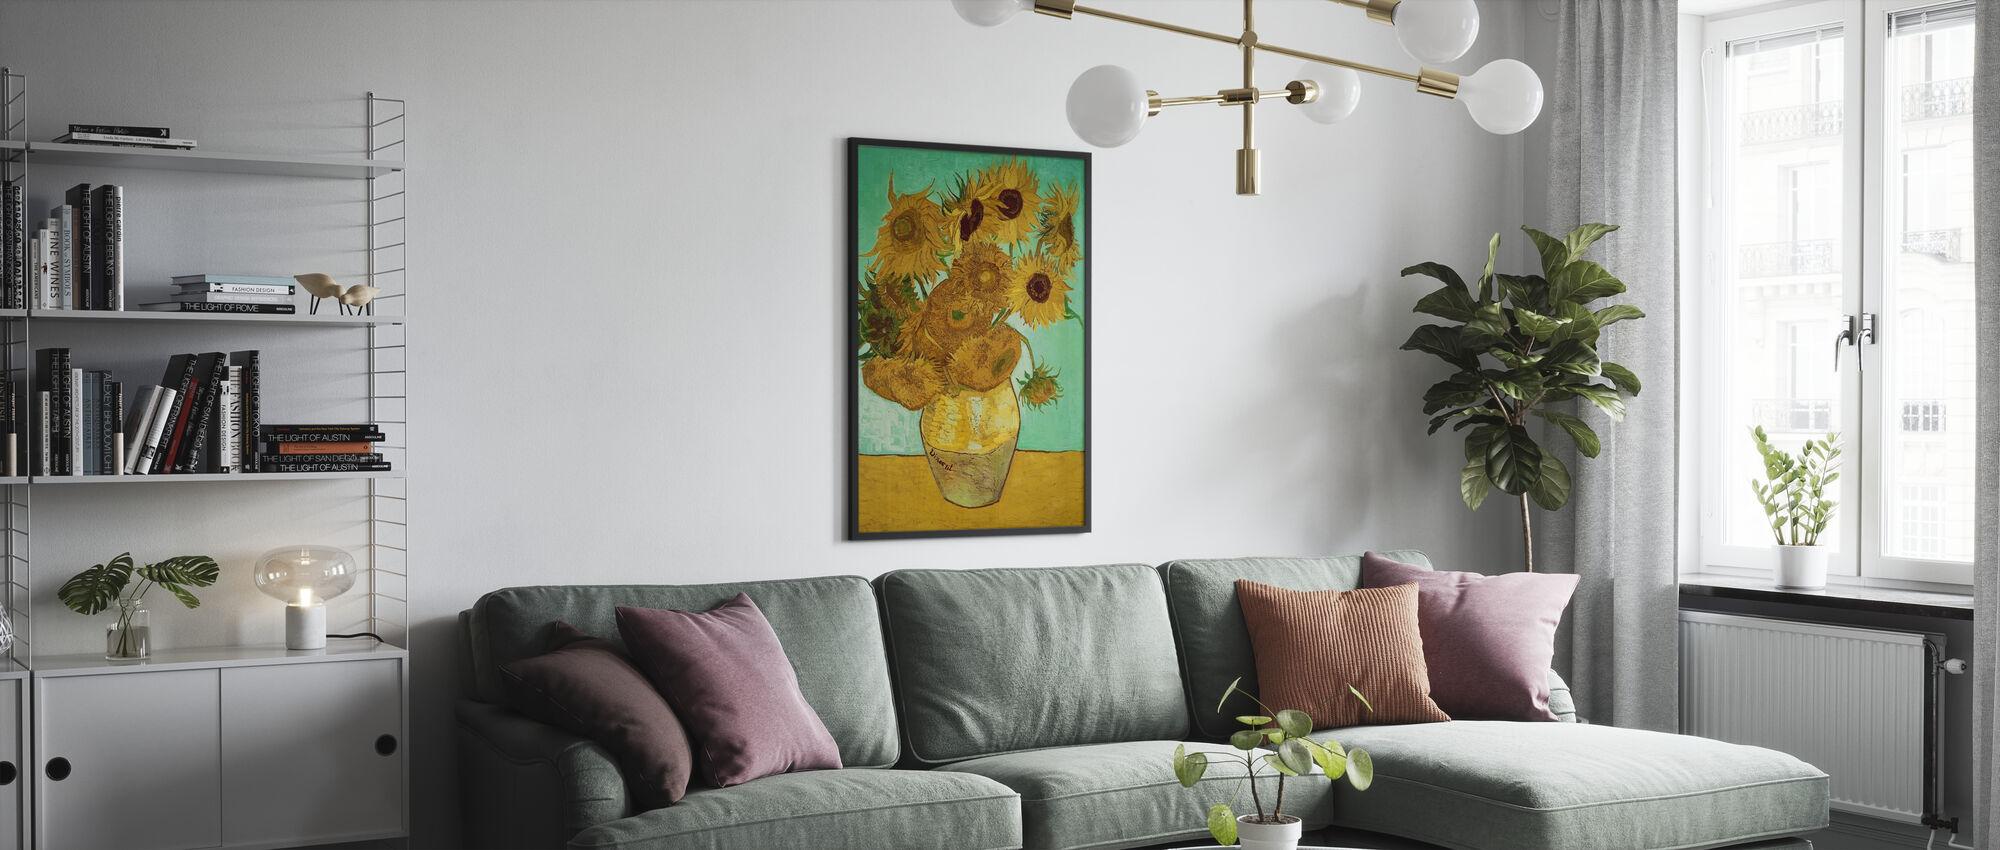 Girasoli - Vincent Van Gogh - Poster - Salotto